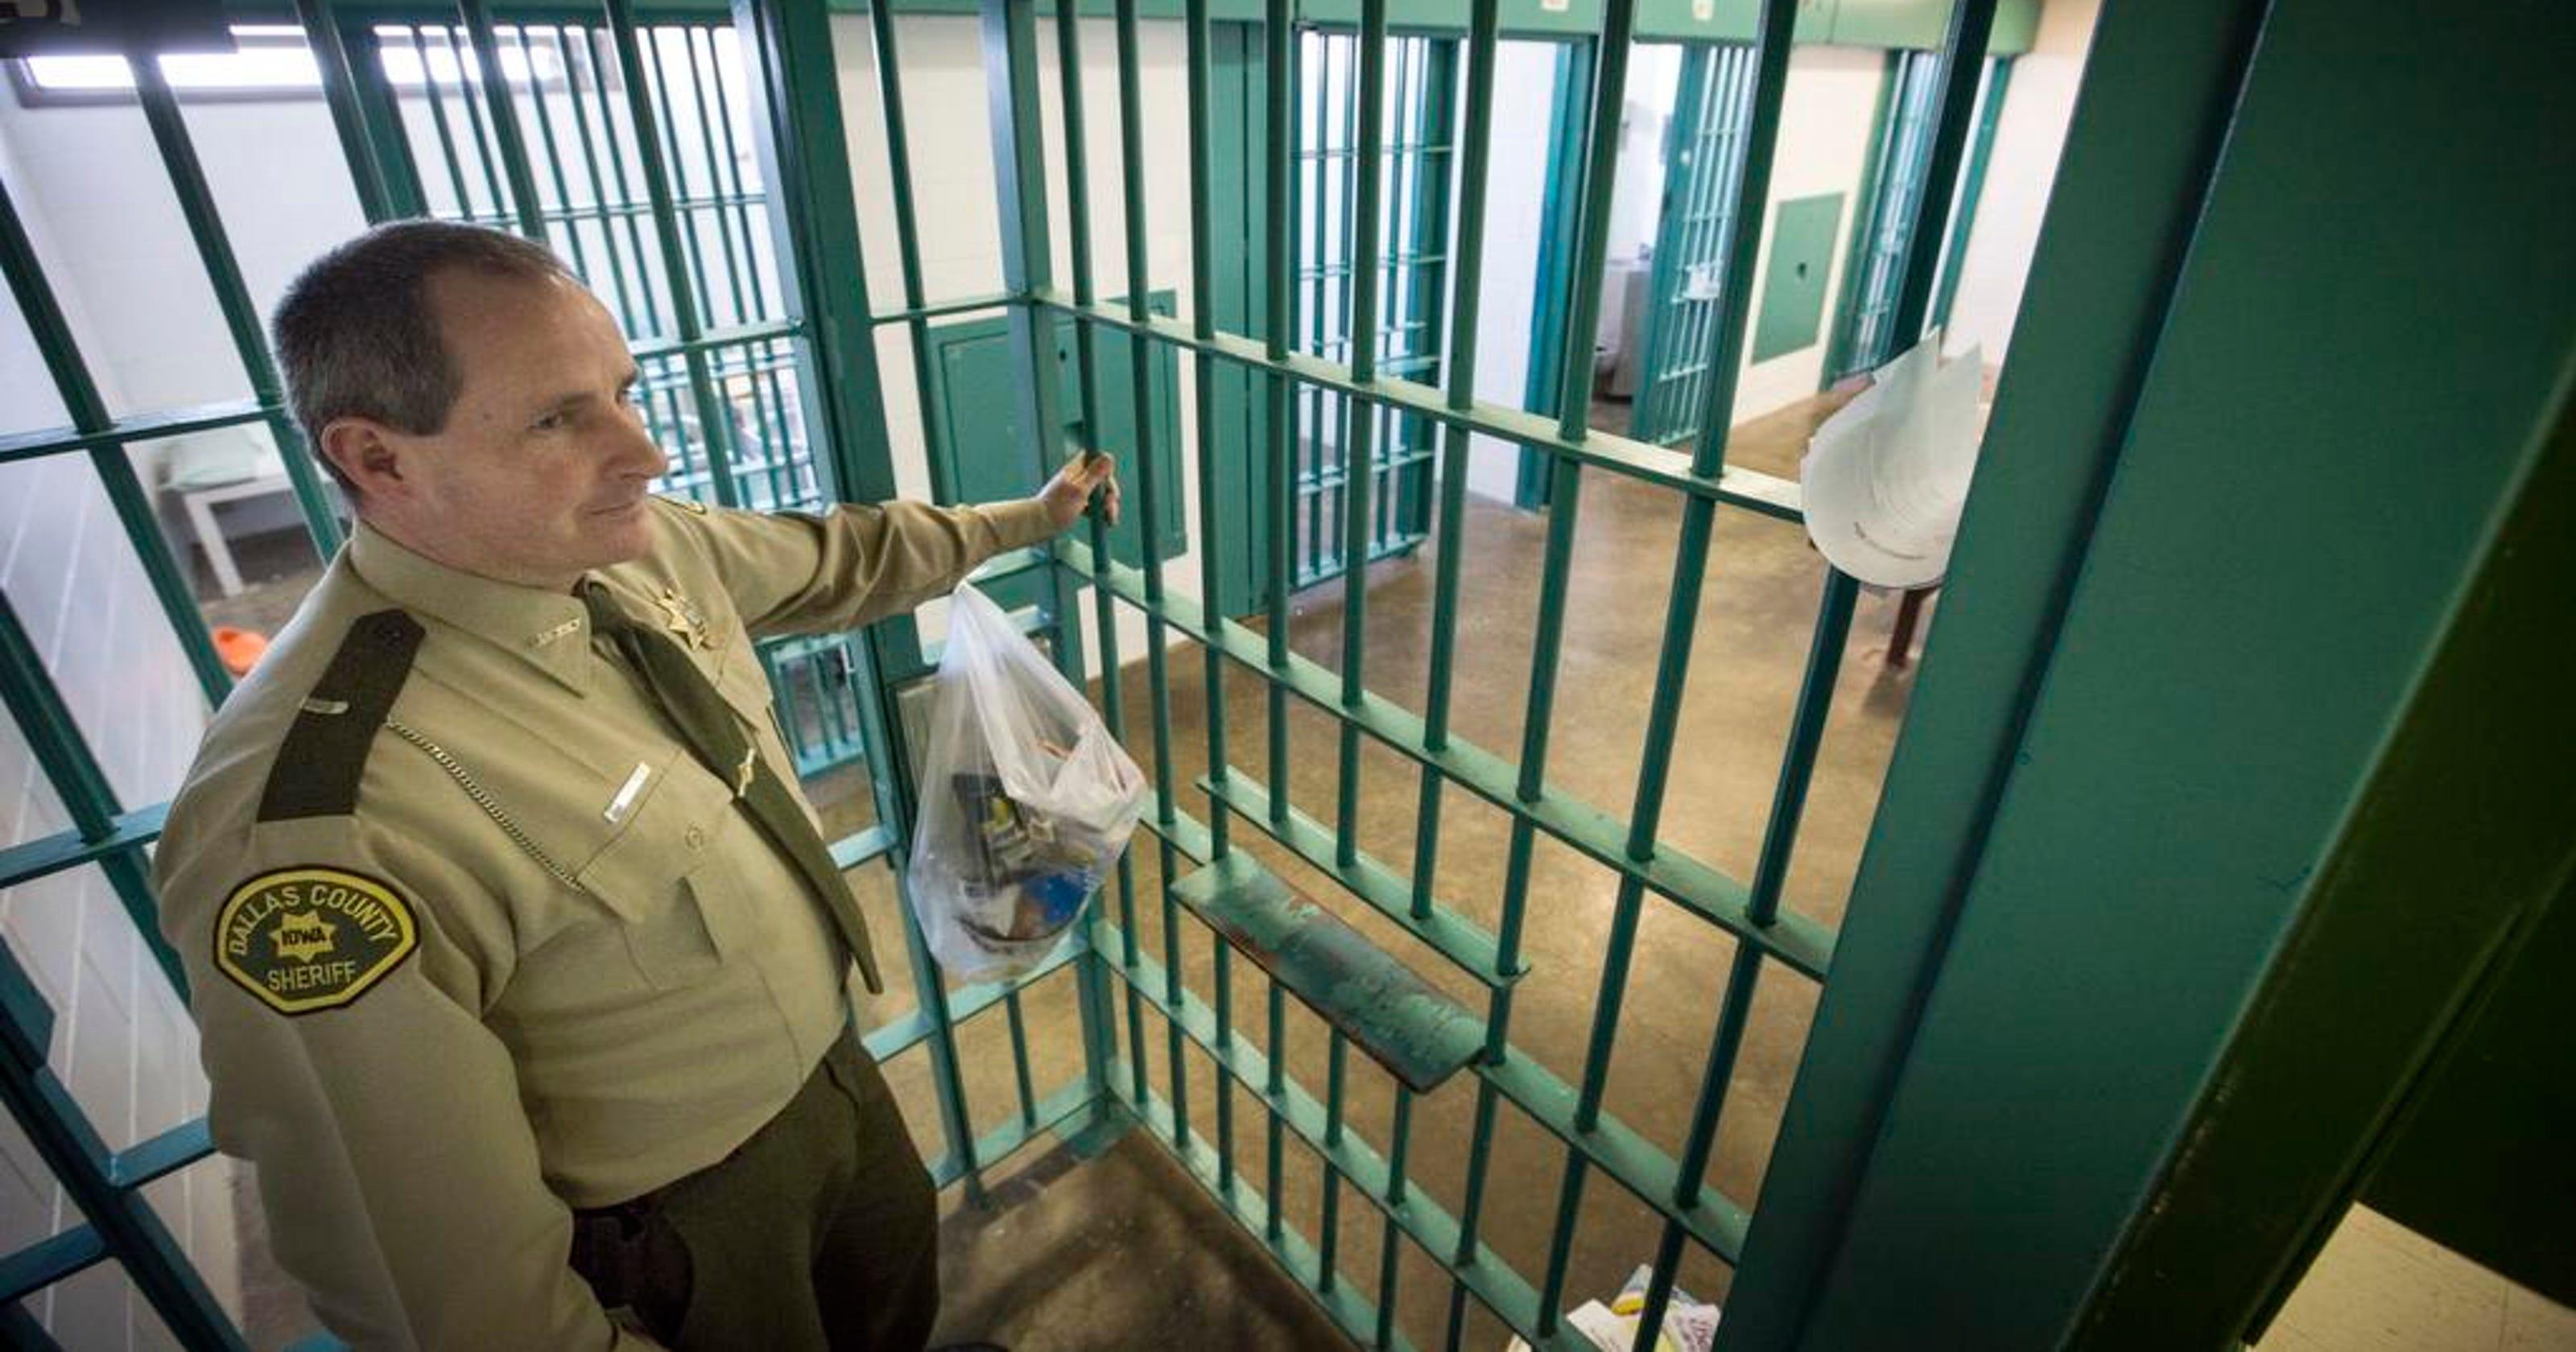 polk sheriff's jail - HD1600×800